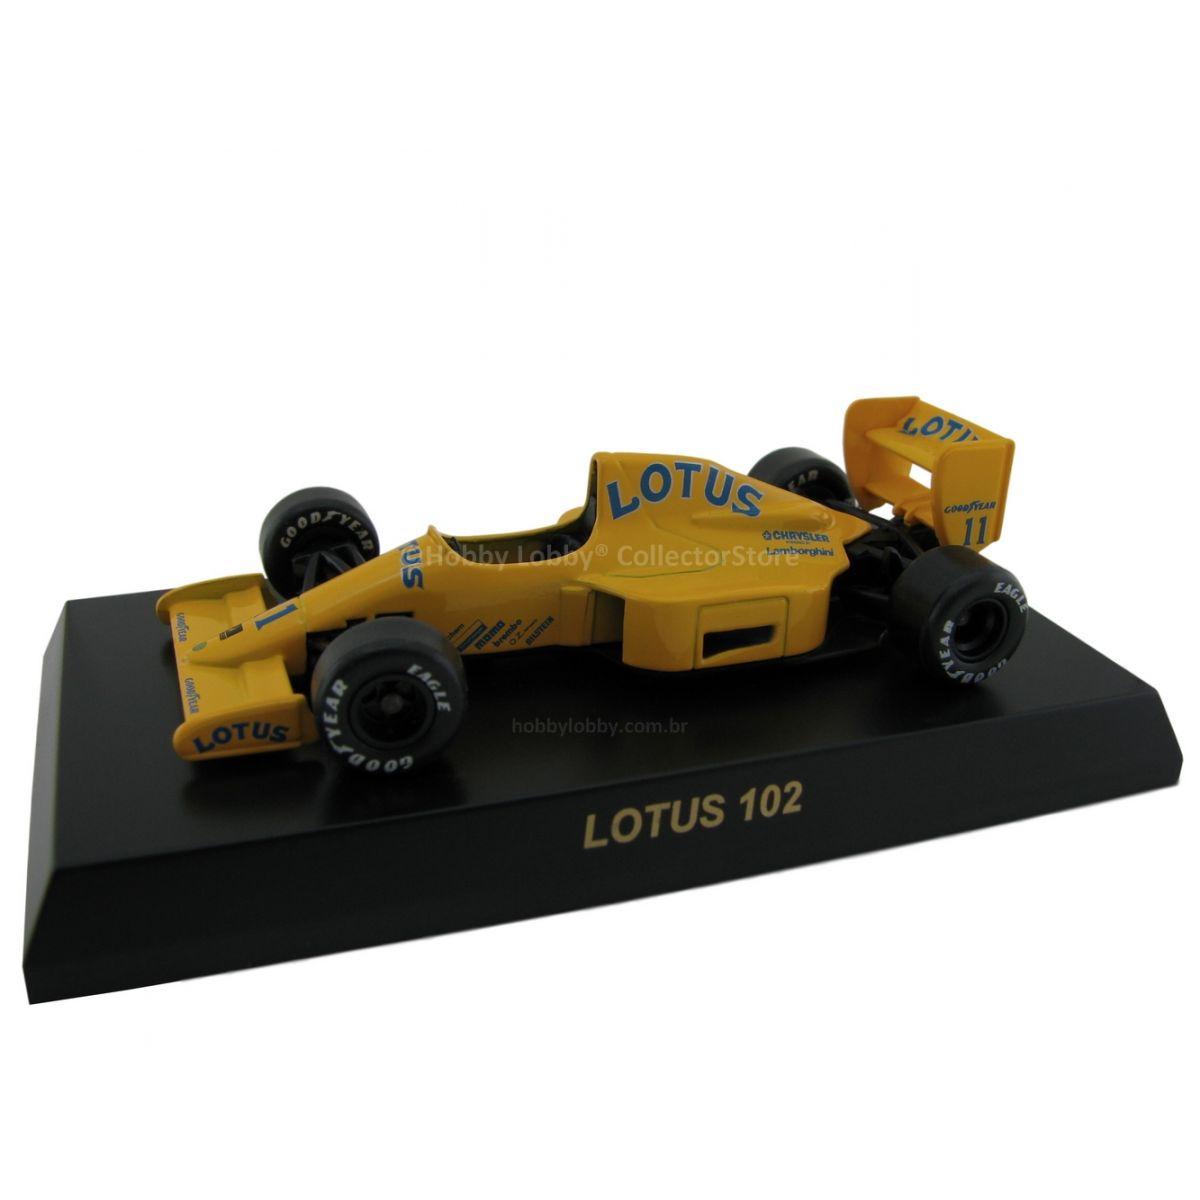 Kyosho - Classic Team Lotus - Lotus 102